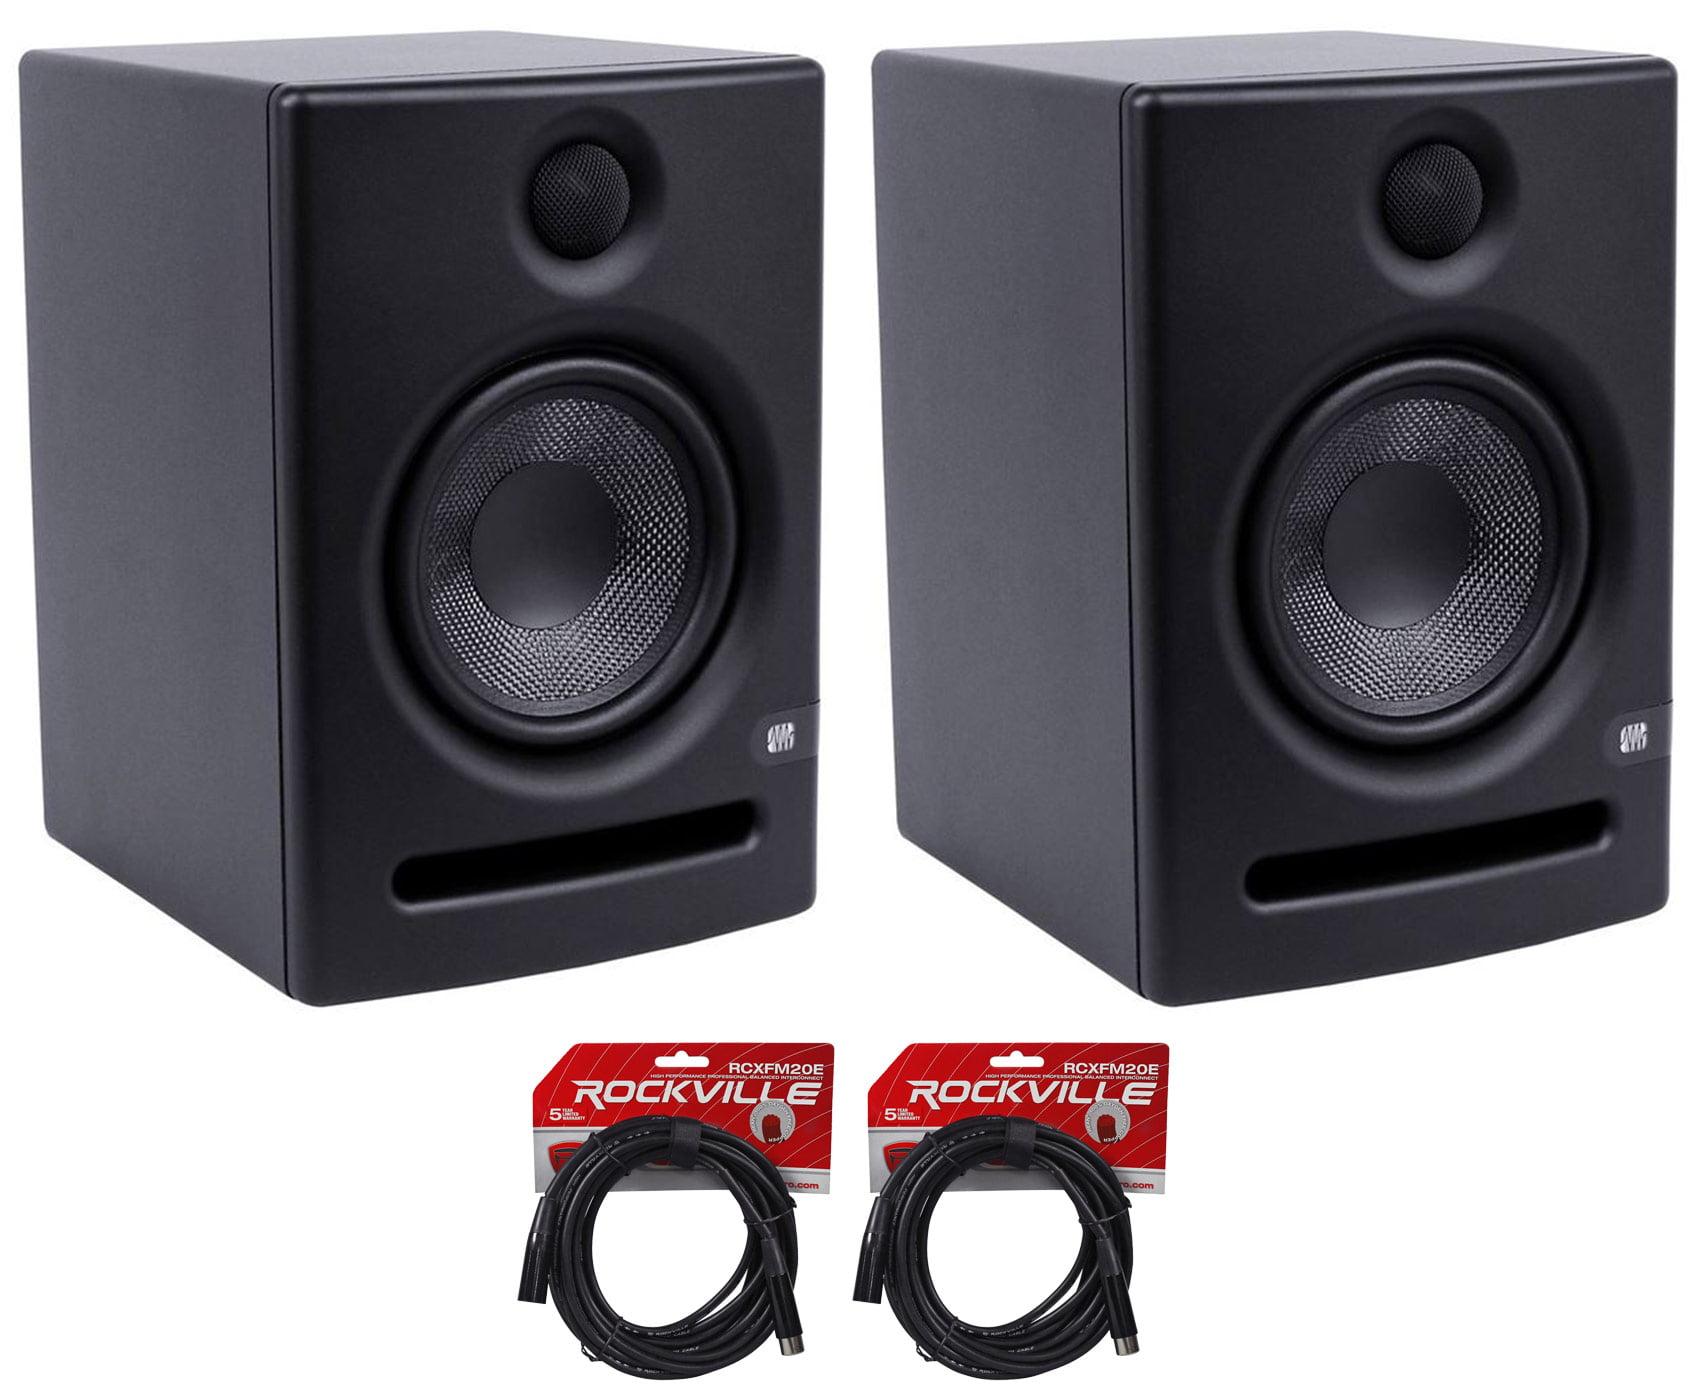 2x Presonus Eris E5 Active Powered Studio Monitors +FREE XLR Cables by PreSonus